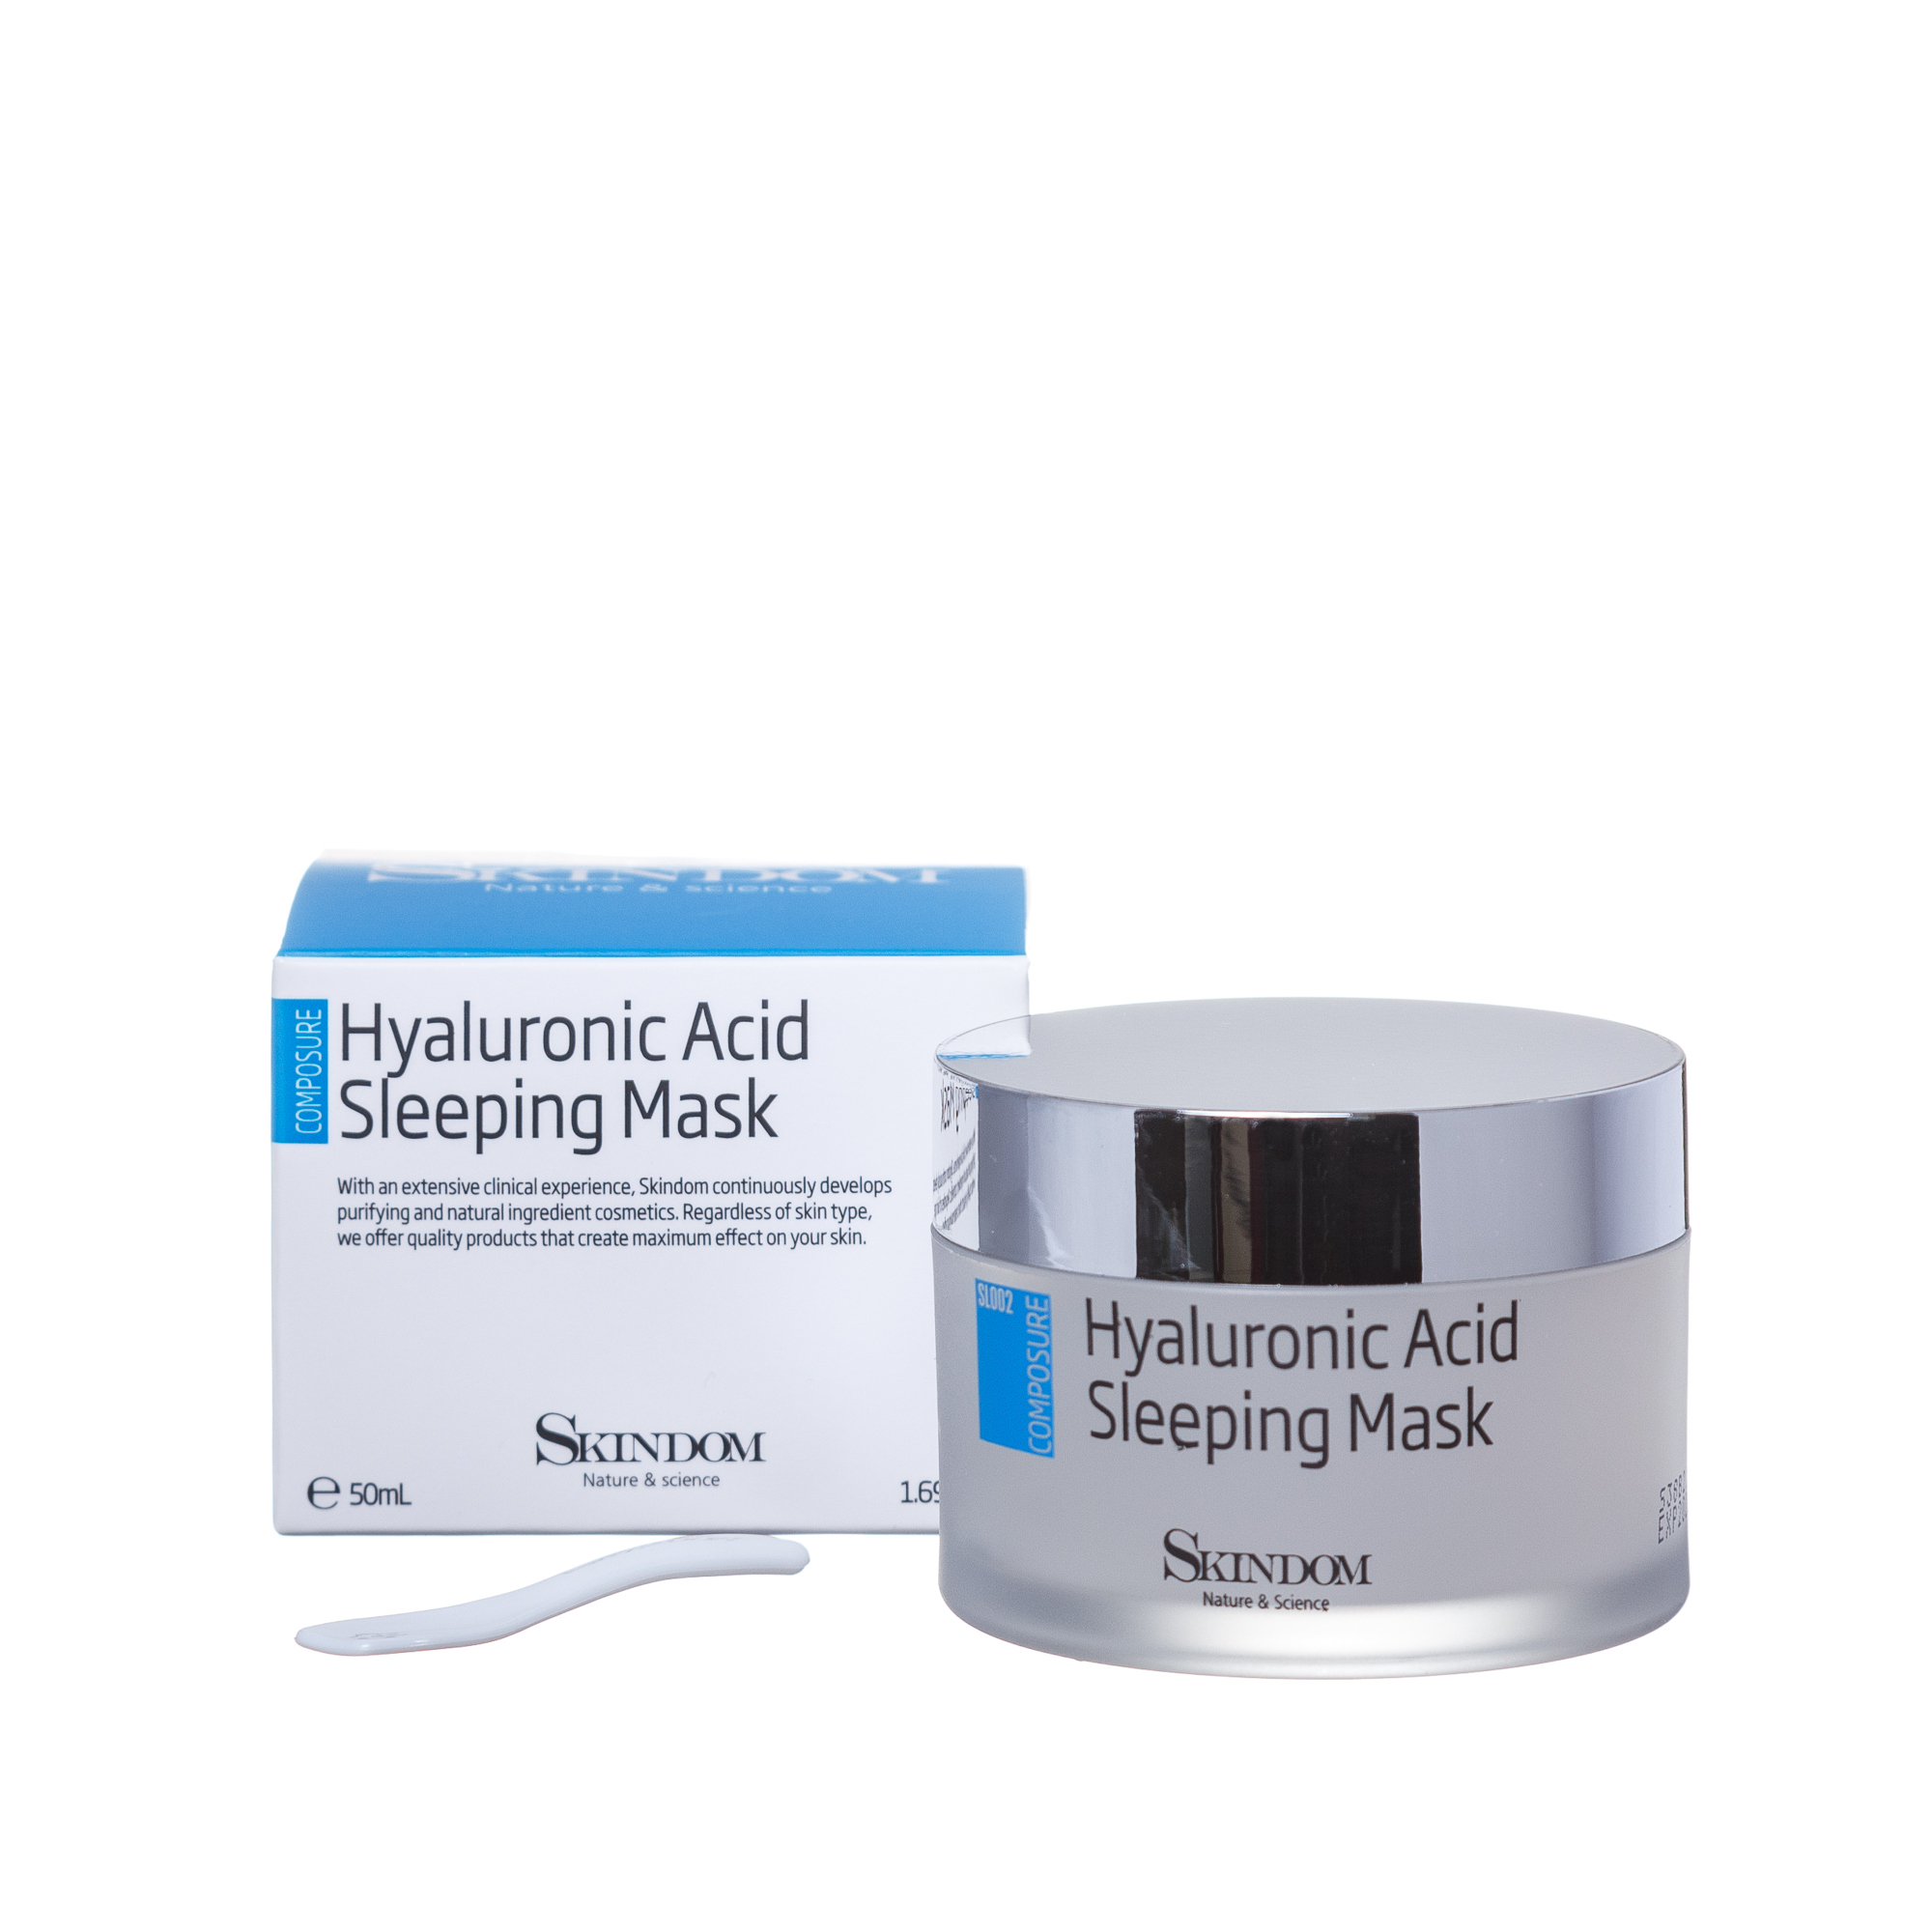 SKINDOM Маска ультраувлажняющая ночная с гиалуроновой кислотой / HYALURONIC ACID SLEEPING MASK 50 мл фото